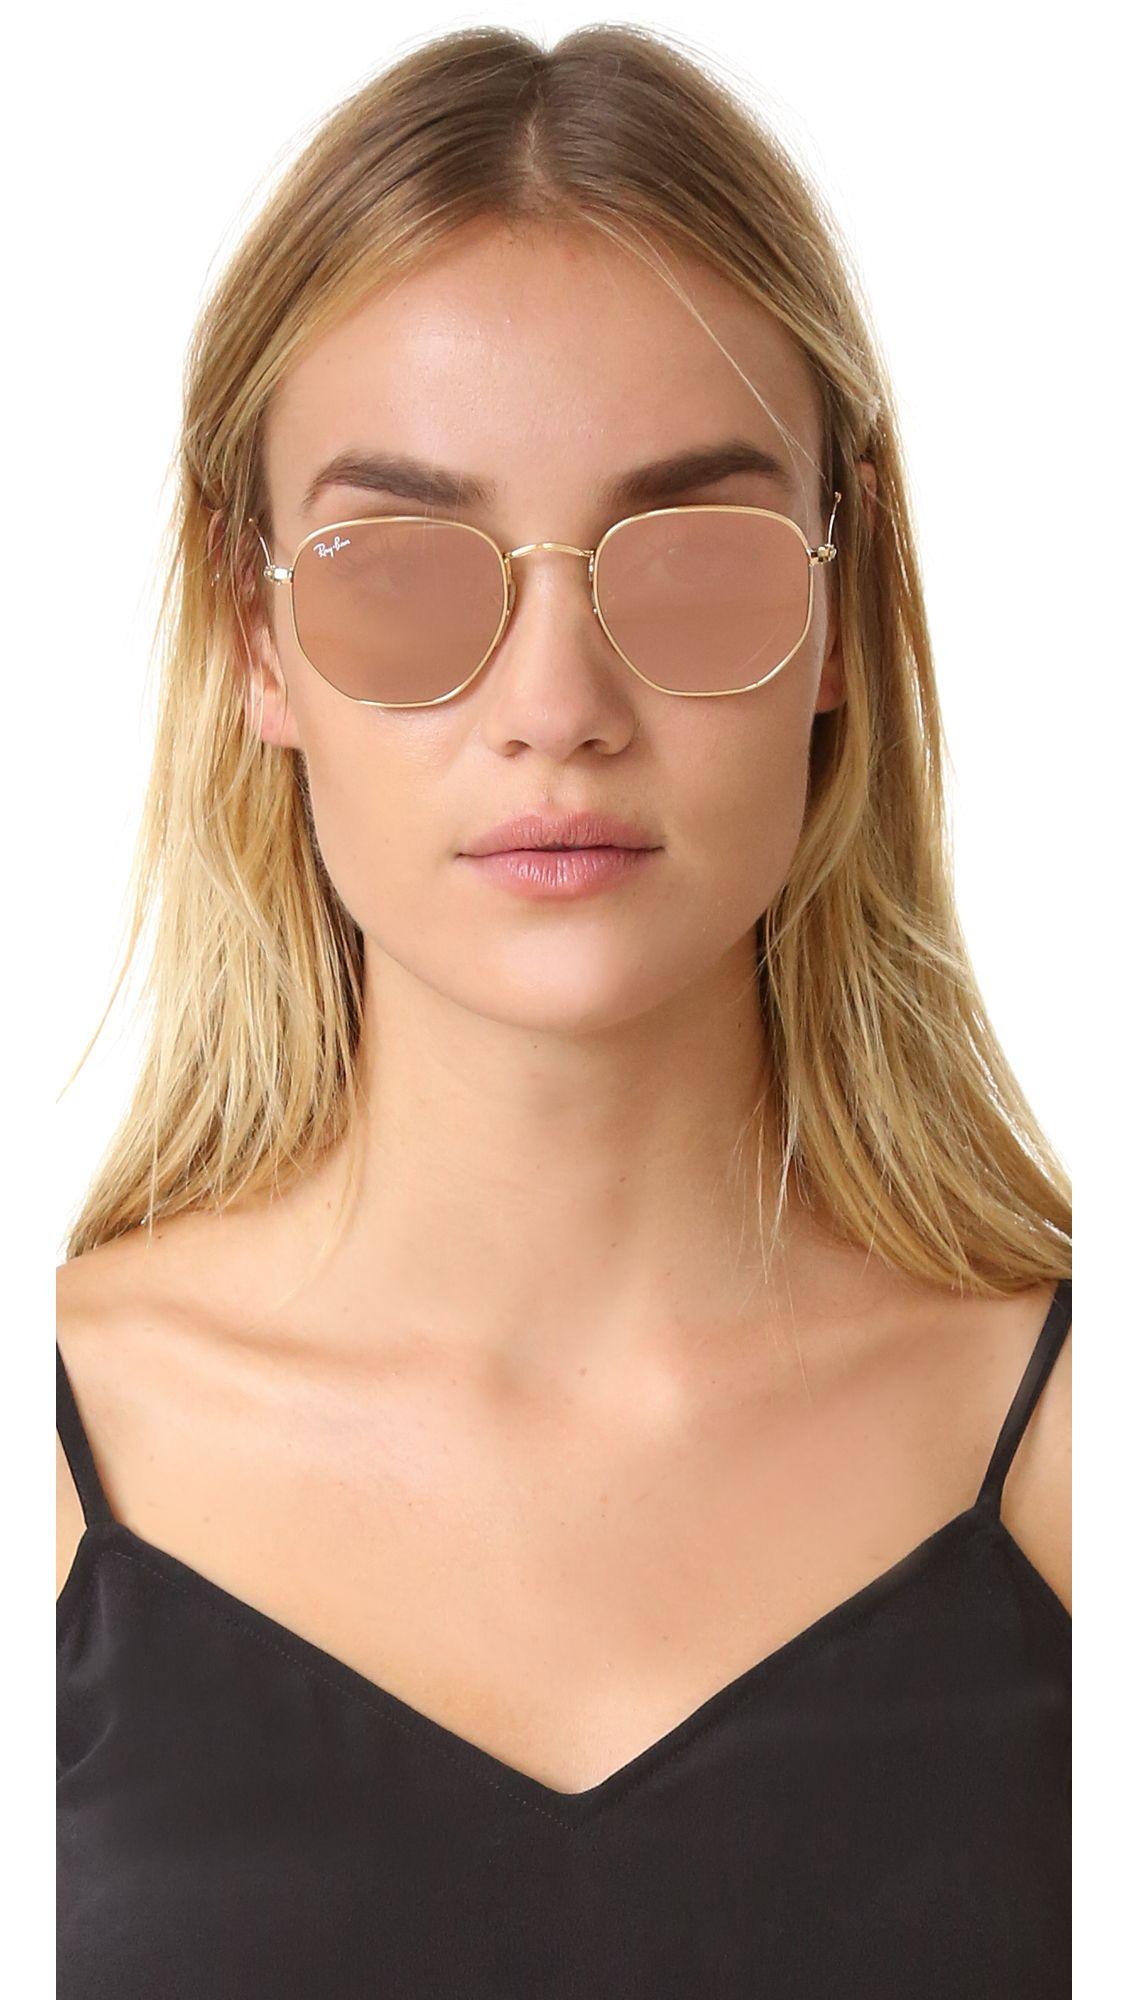 9d430f1646c67 RB3548N Hexagonal Mirrored Sunglasses